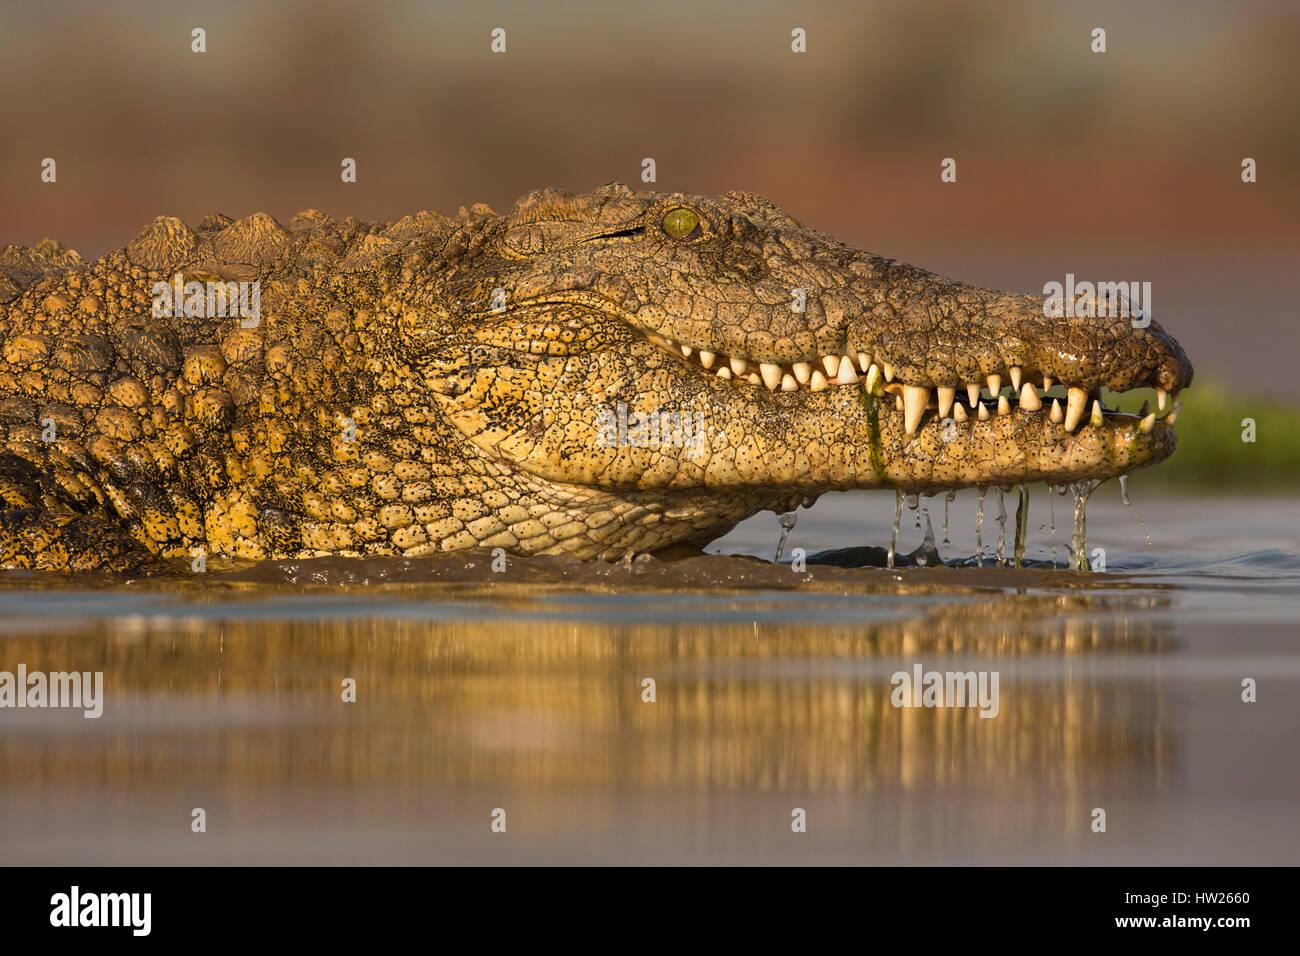 El cocodrilo del Nilo (Crocodylus niloticus) Zimanga Private Game Reserve, KwaZulu-Natal, Sudáfrica, septiembre Imagen De Stock